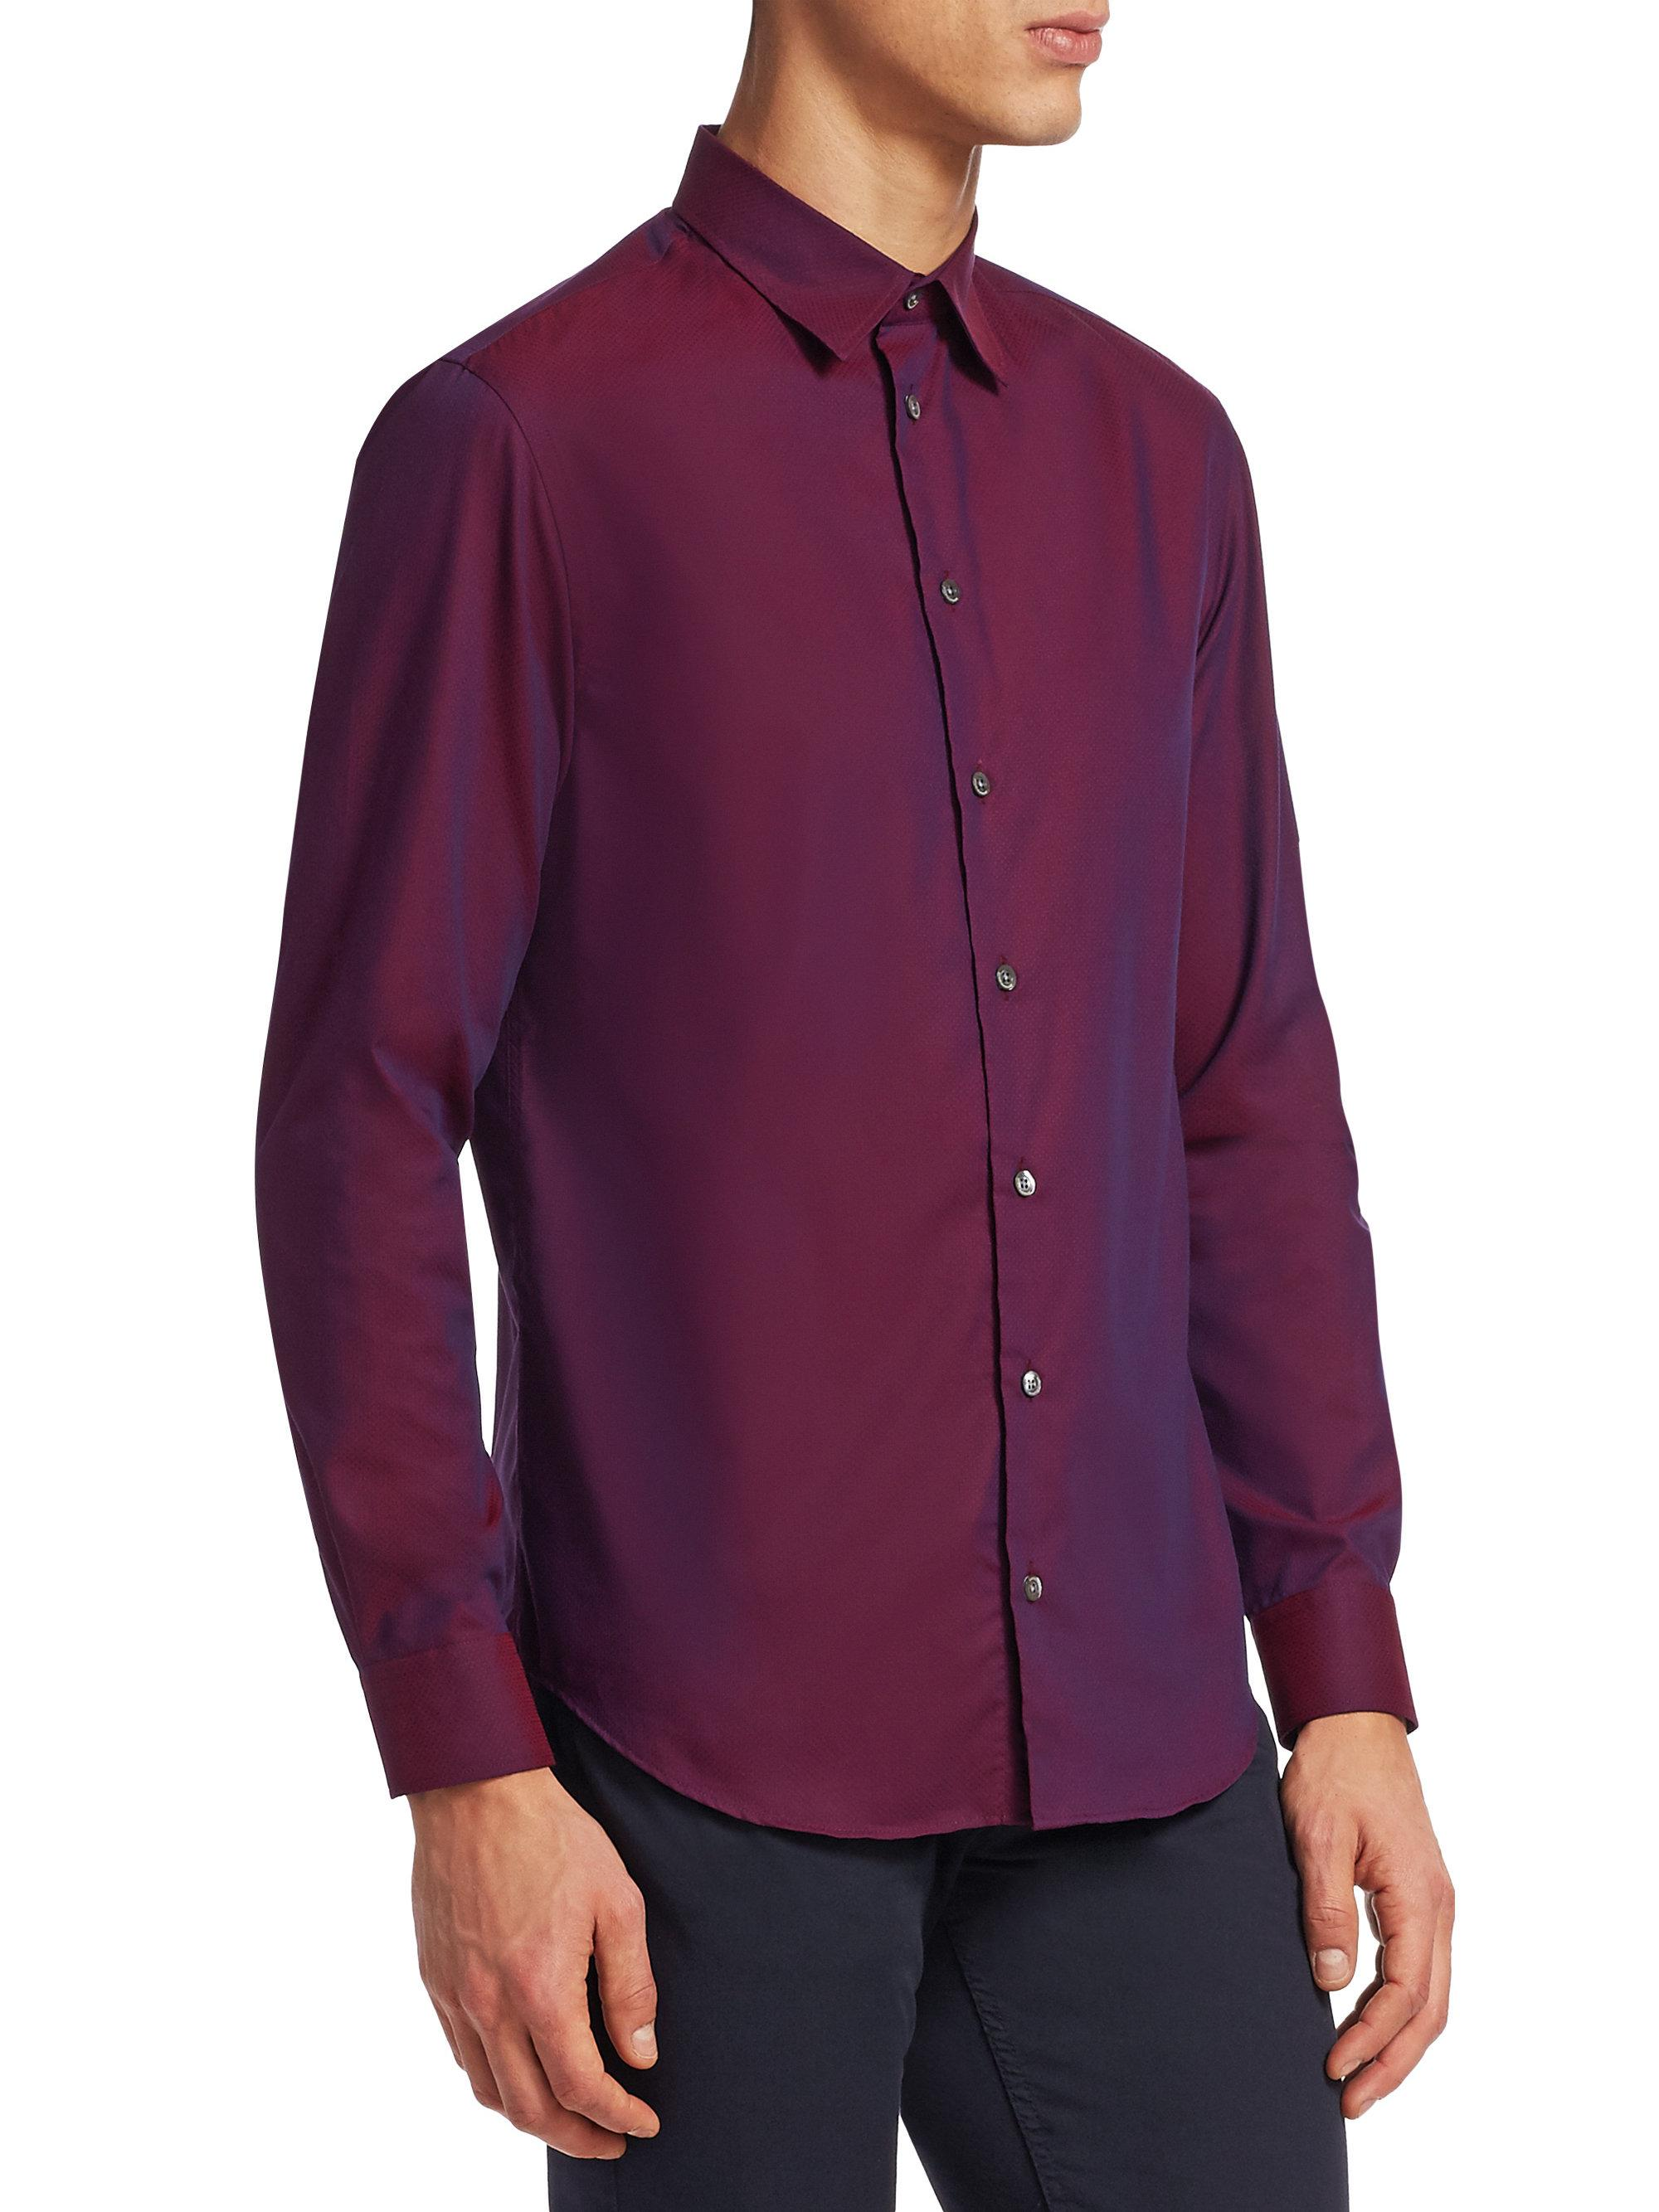 Lyst emporio armani classic cotton button down shirt in for Preppy button down shirts